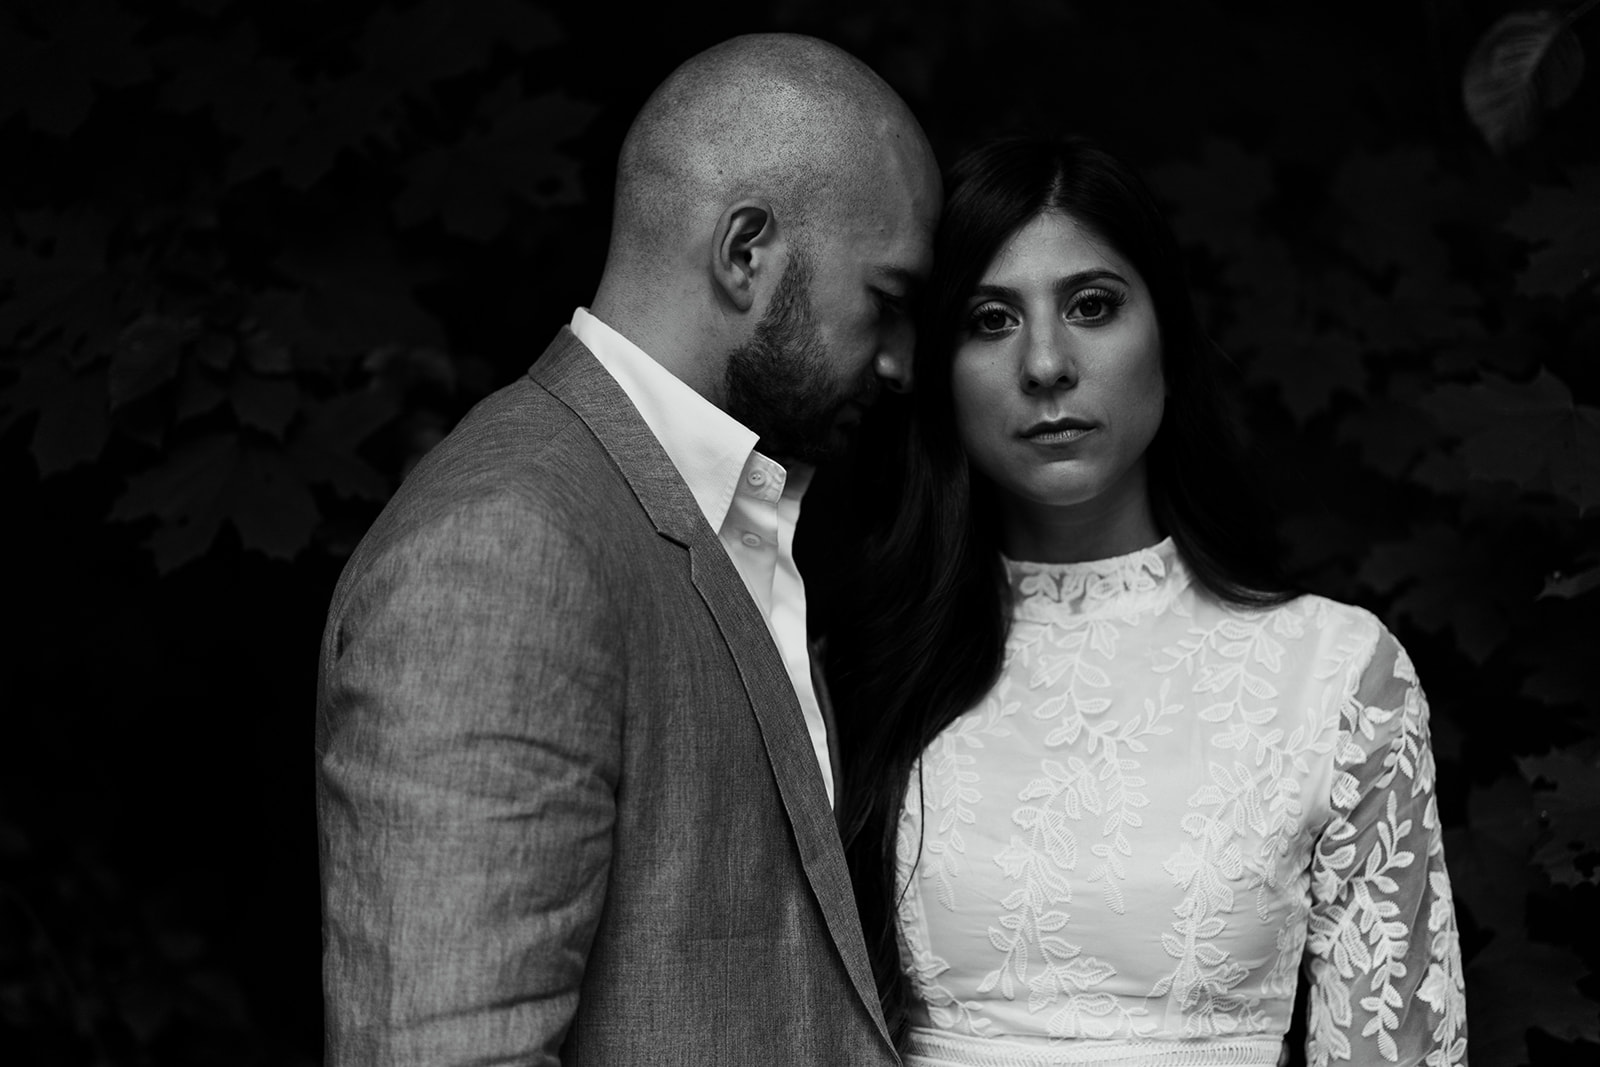 Sabri-photographe-sayde-_-george-wedding-354.jpg